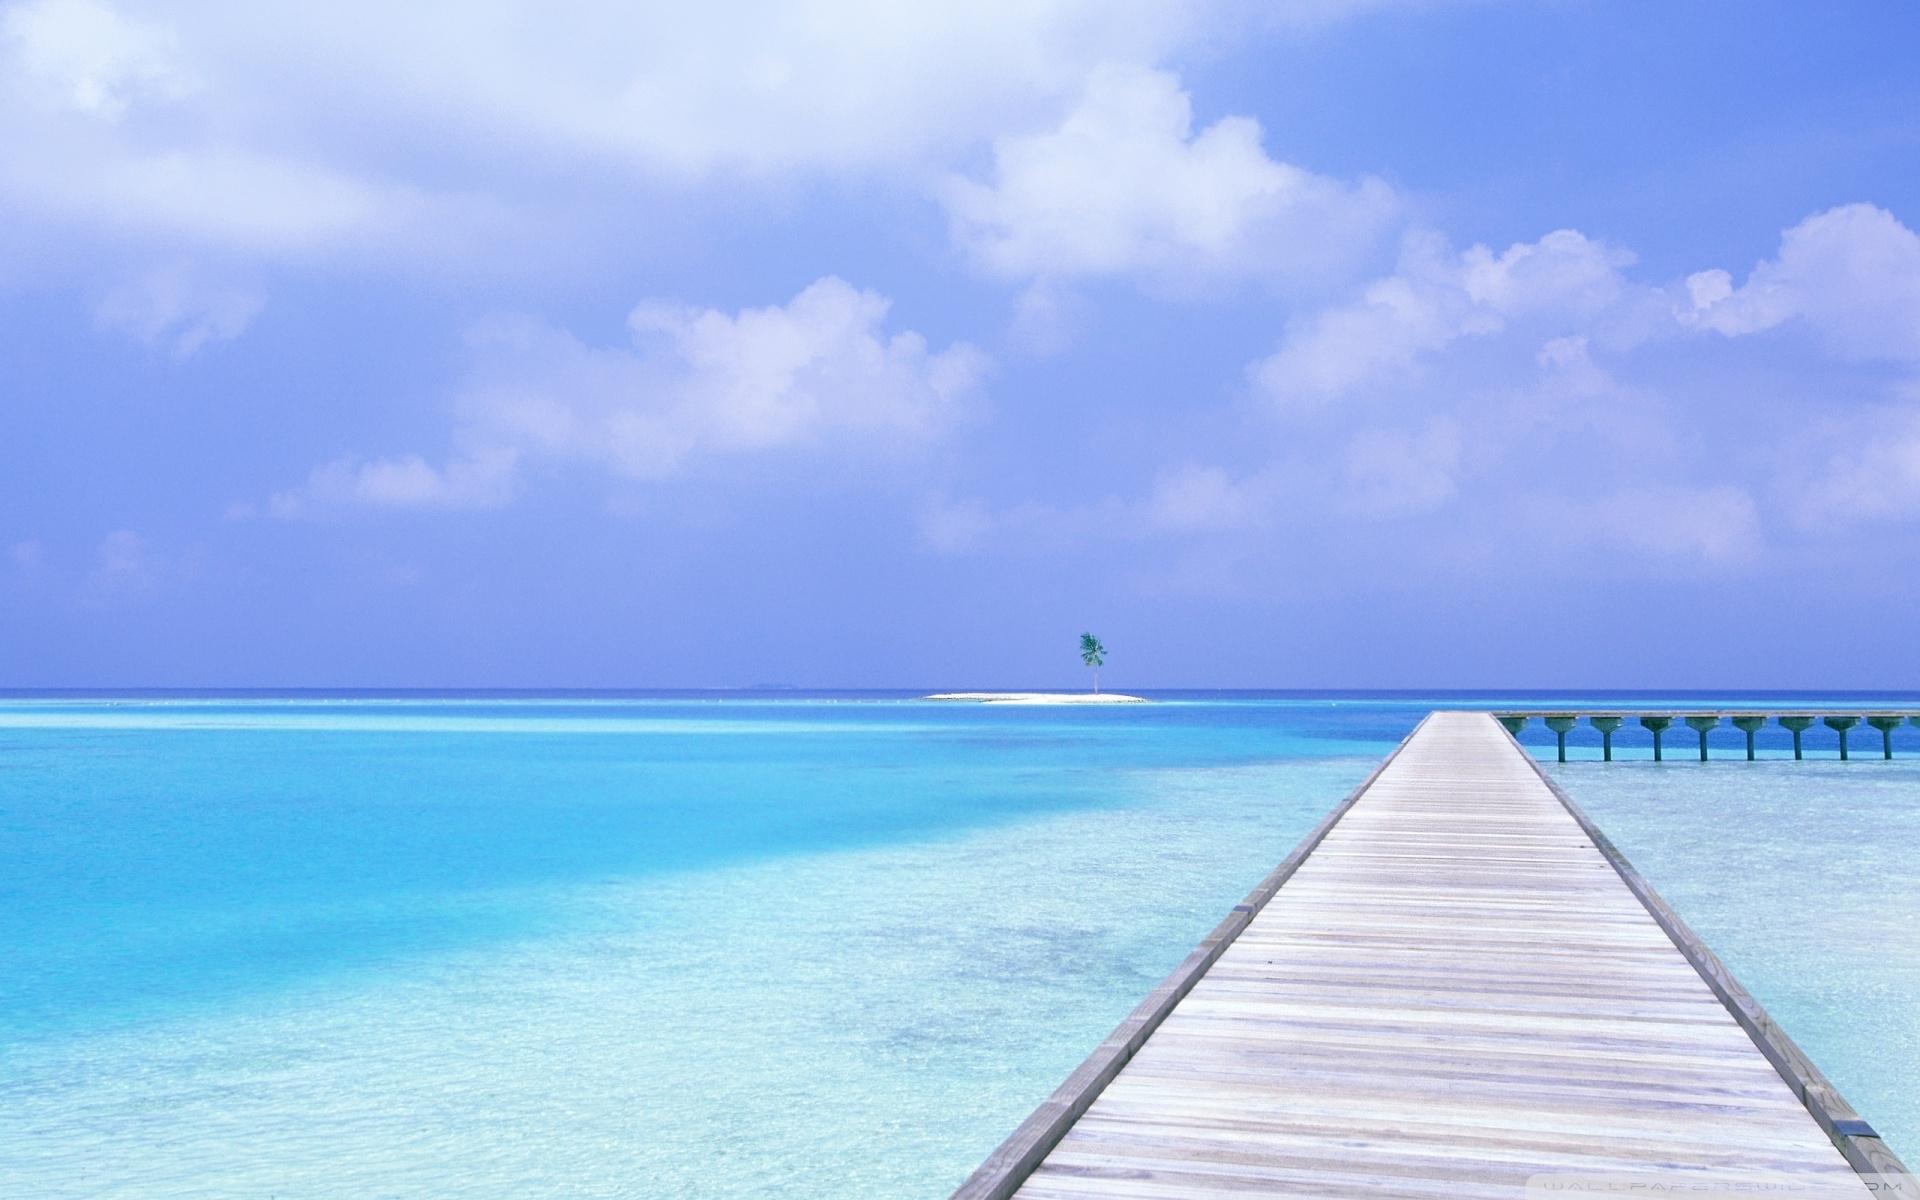 footbridge over blue ocean ❤ 4k hd desktop wallpaper for 4k ultra